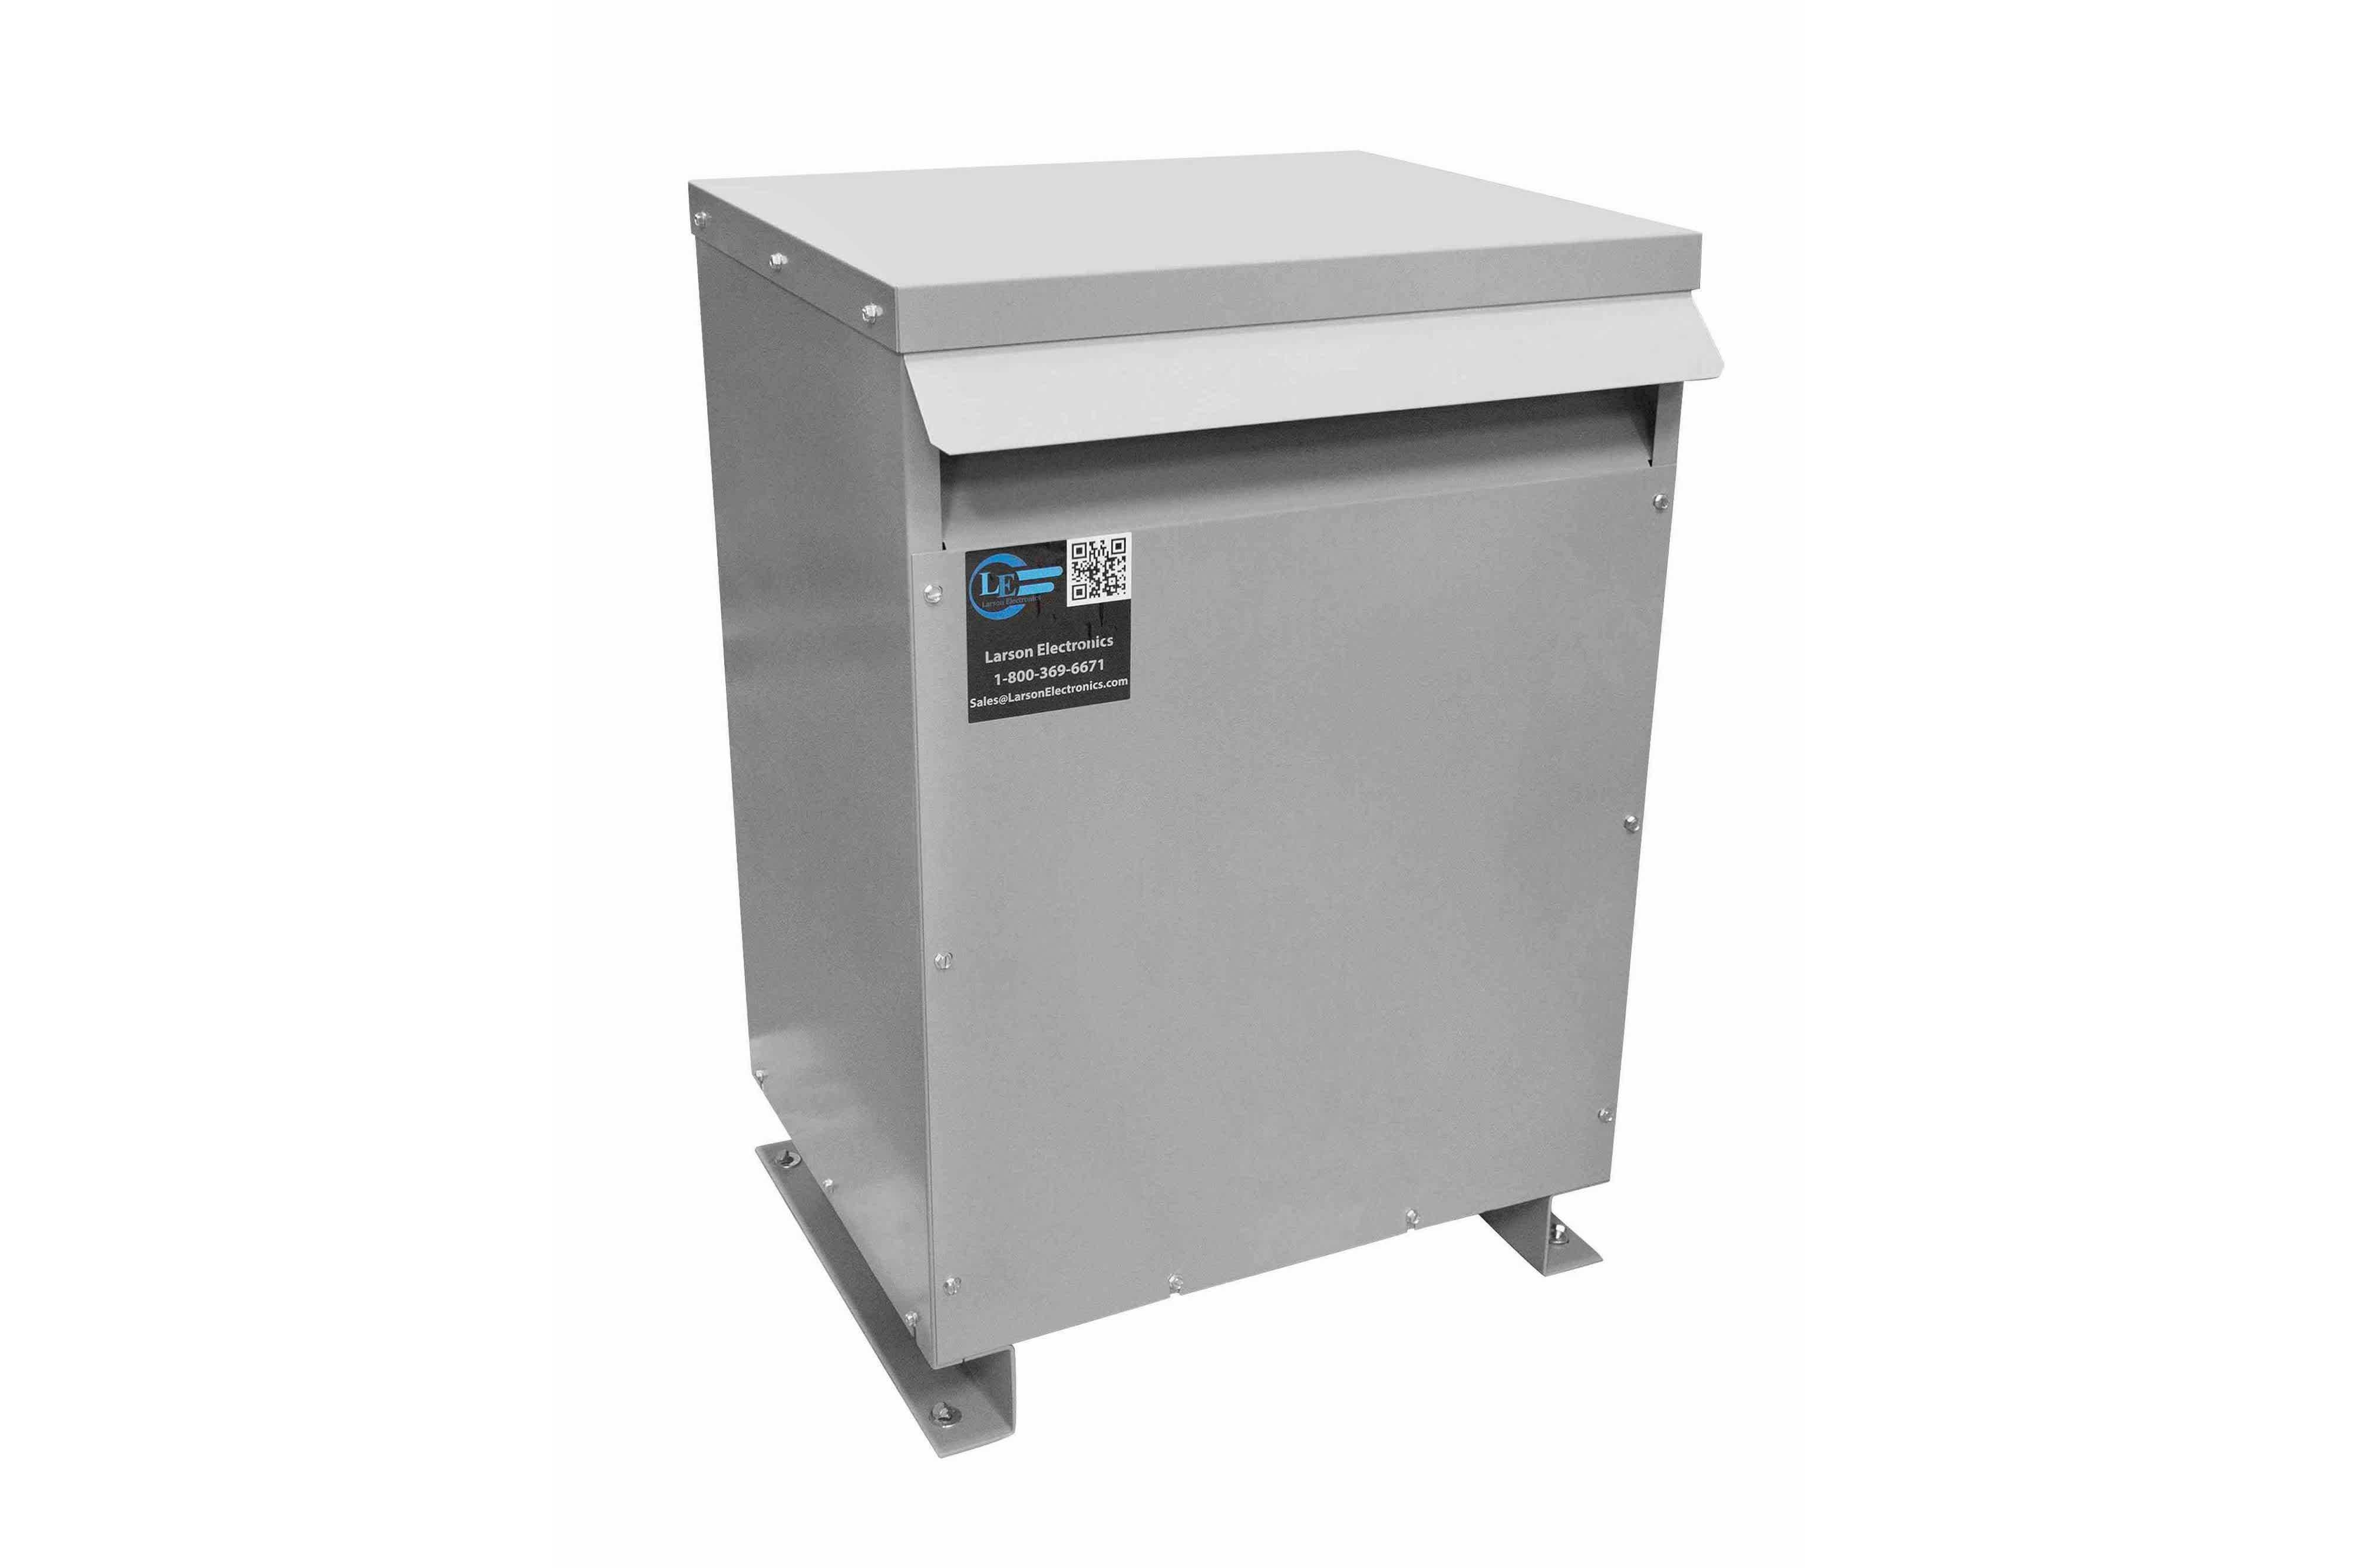 70 kVA 3PH Isolation Transformer, 460V Wye Primary, 240V/120 Delta Secondary, N3R, Ventilated, 60 Hz